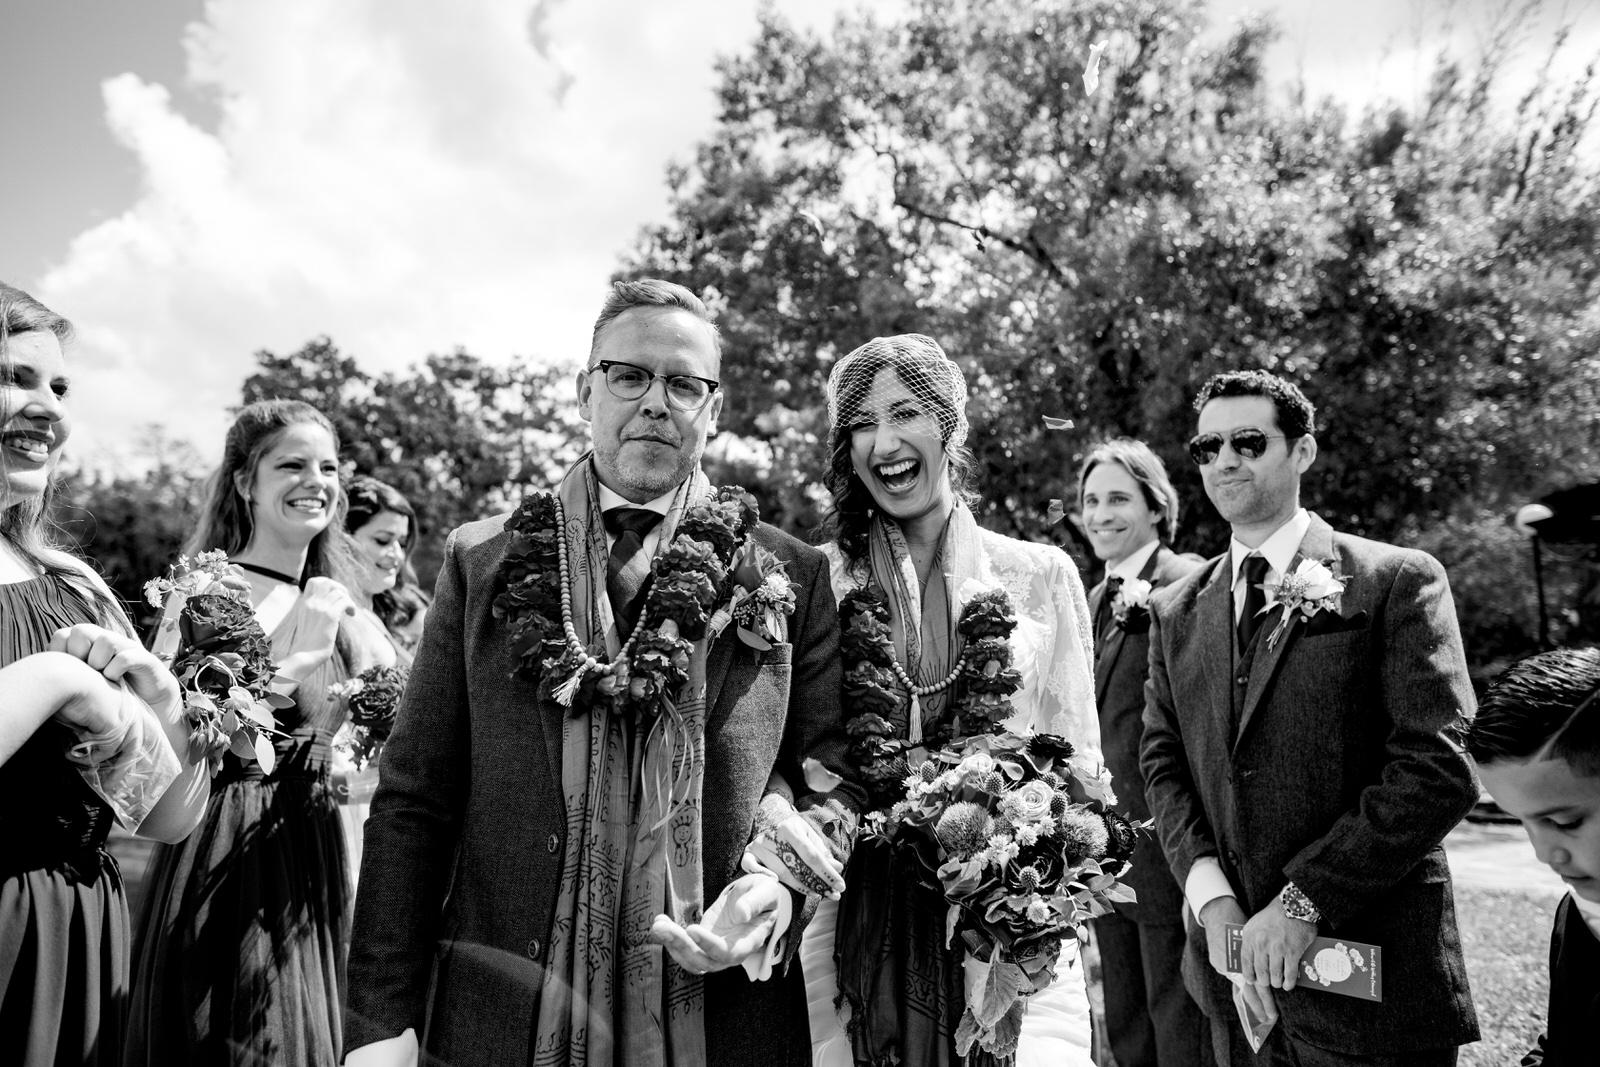 kashi-ashram-wedding-ceremony-bride-groom-wedding-party.jpg